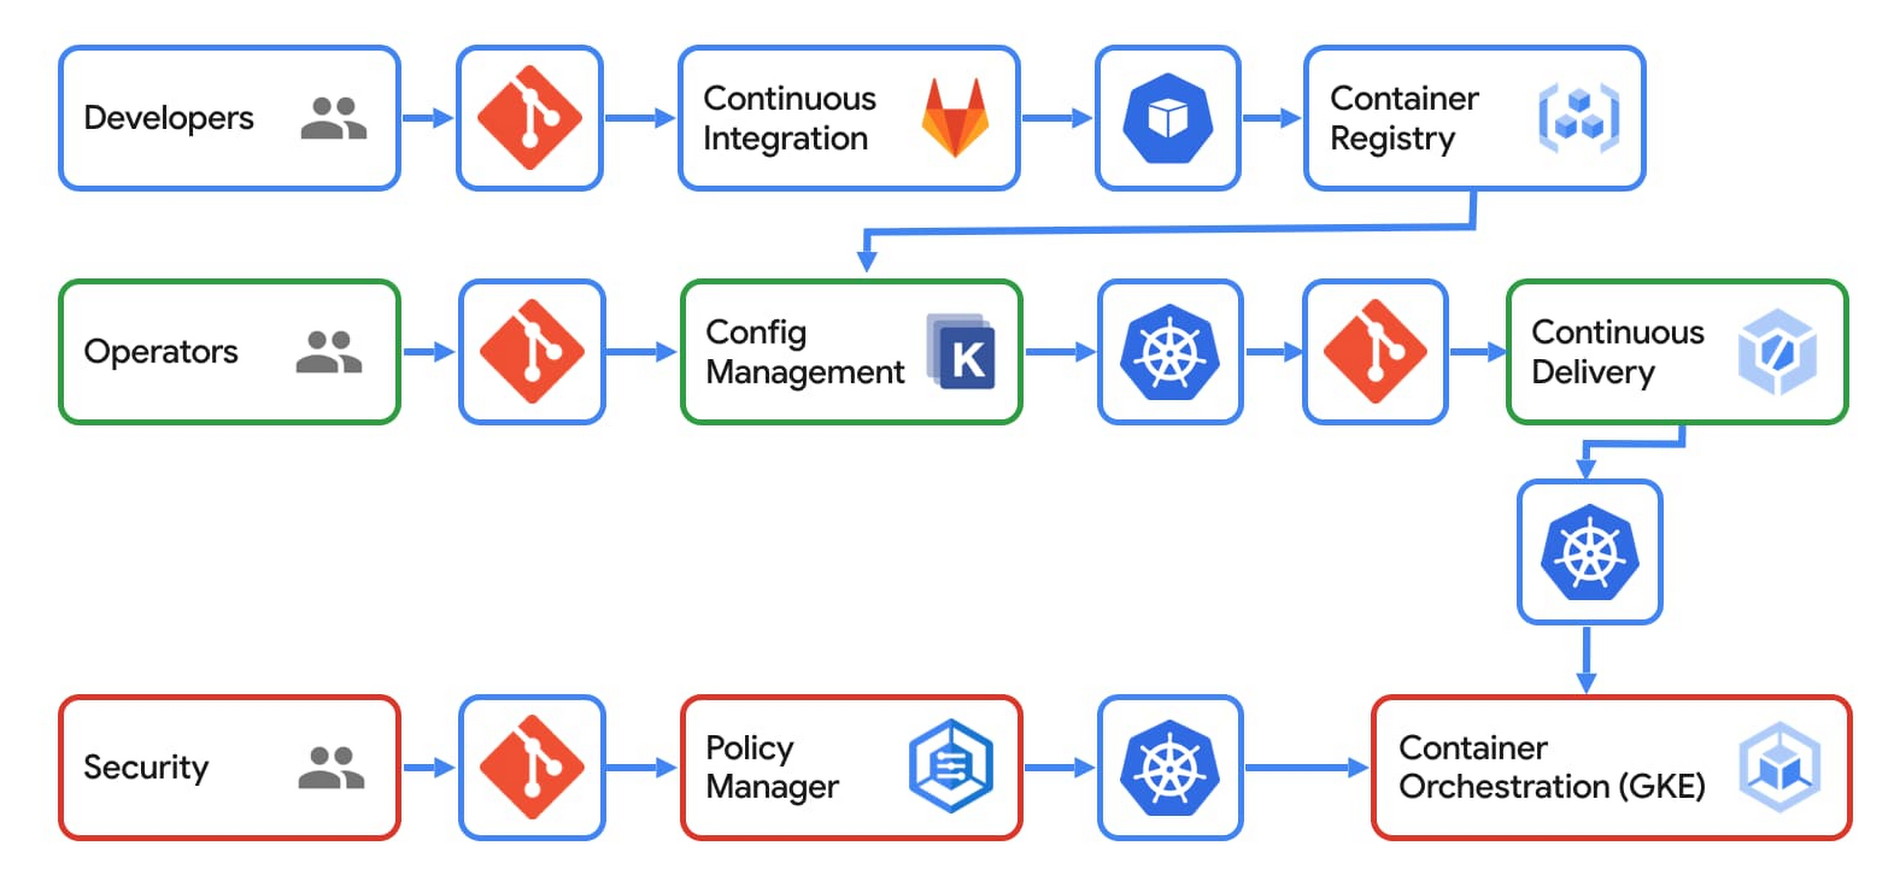 CI_CD users and tools.jpg